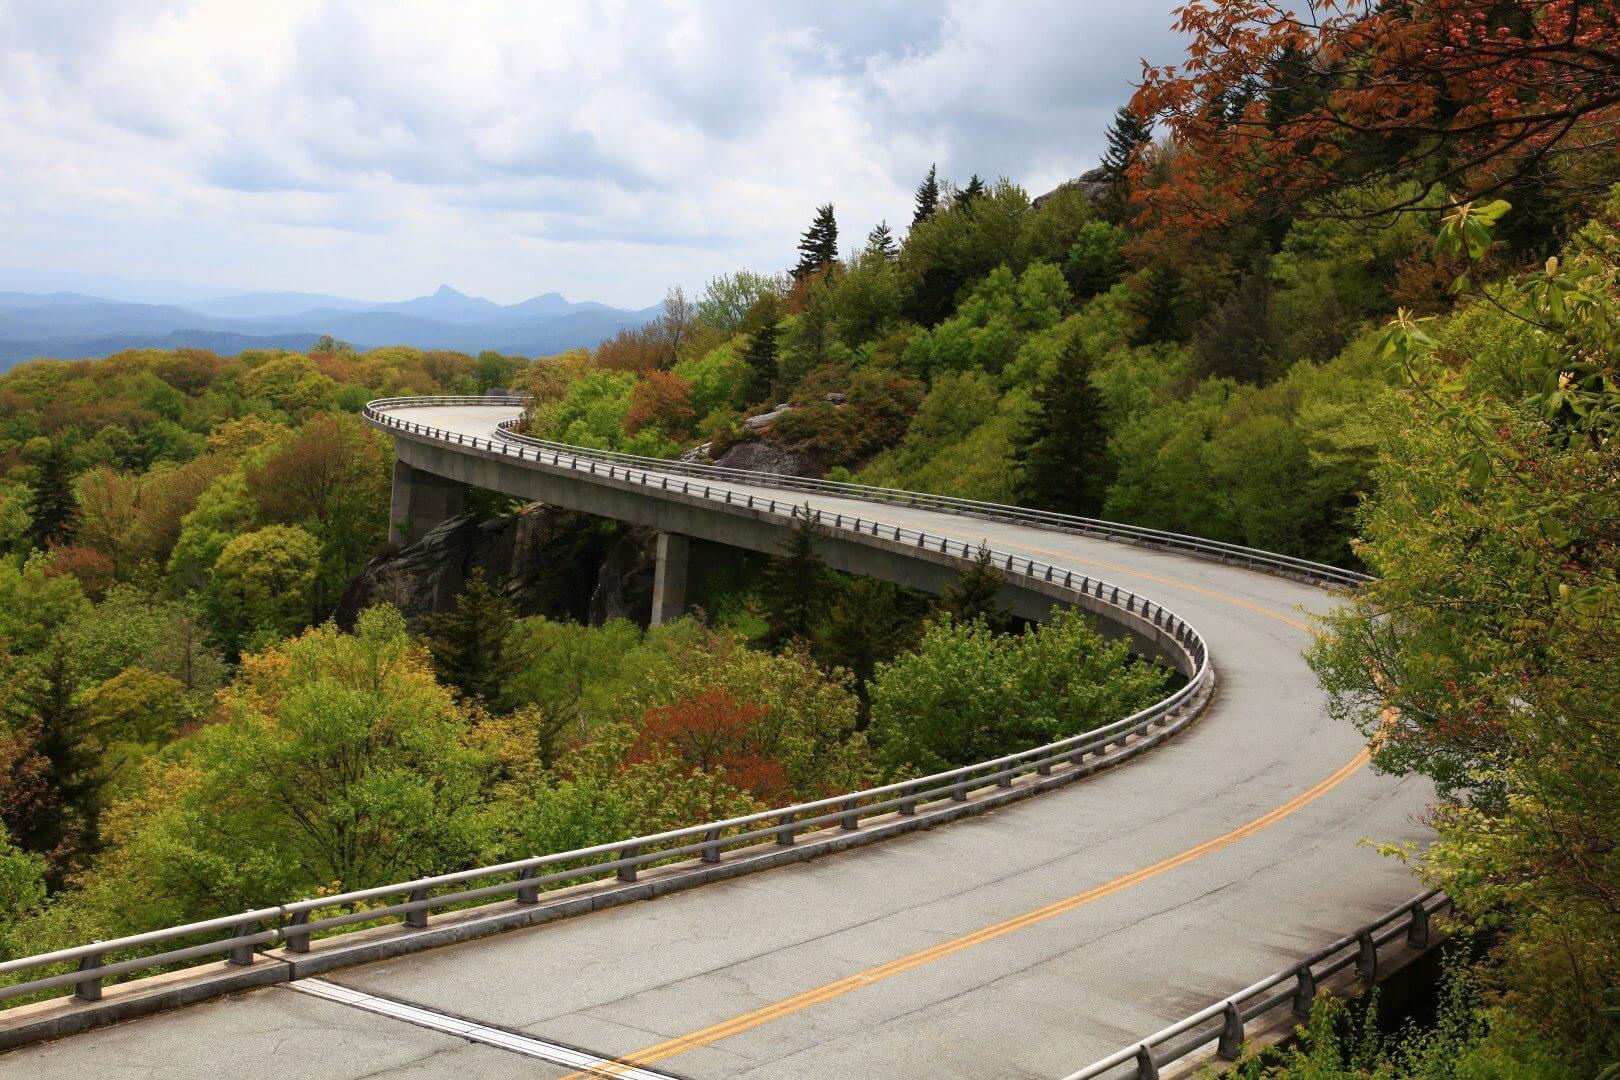 Blue Ridge Parkway - North Carolina and Virginia